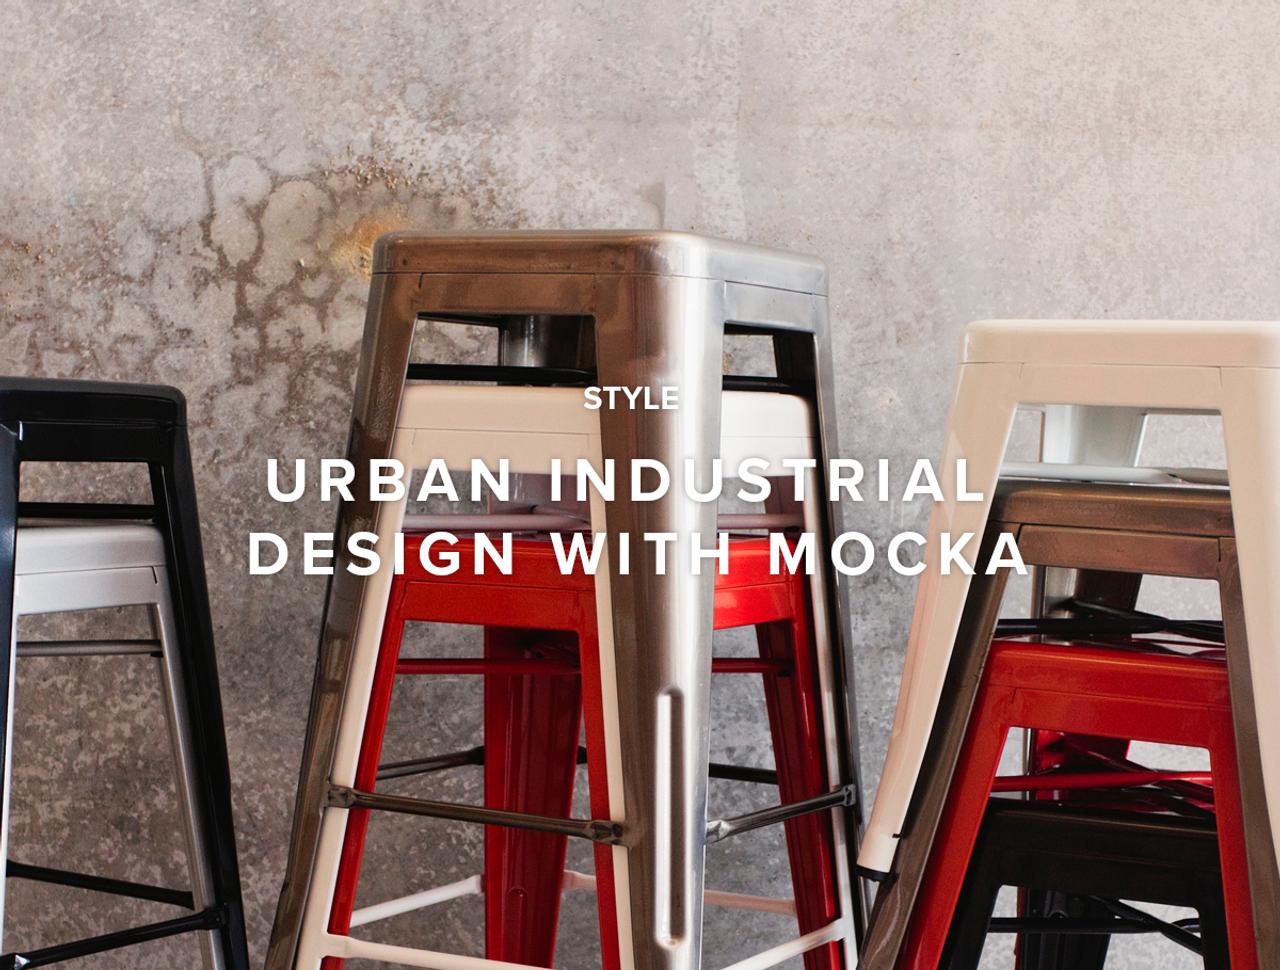 Urban Industrial Design With Mocka